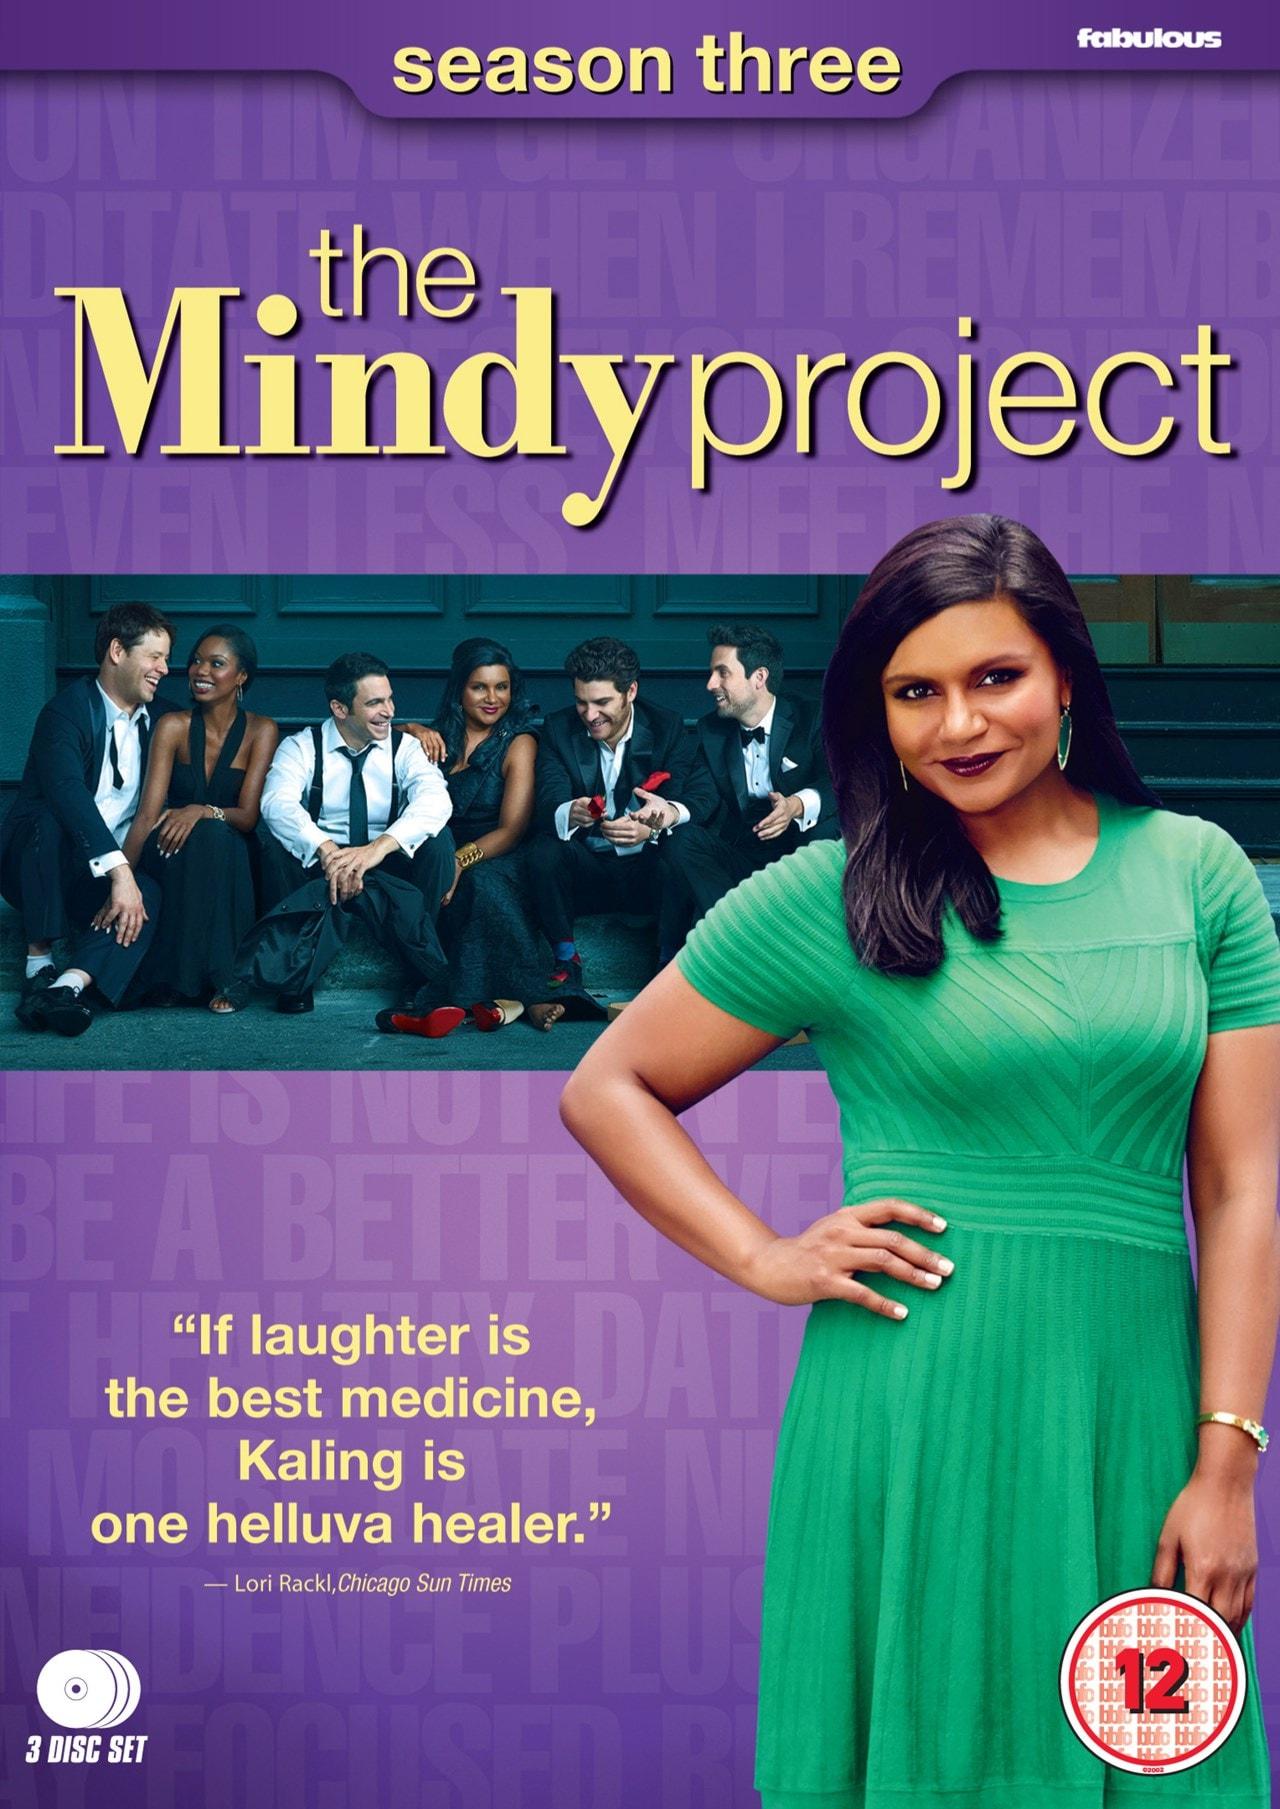 The Mindy Project: Season 3 - 1